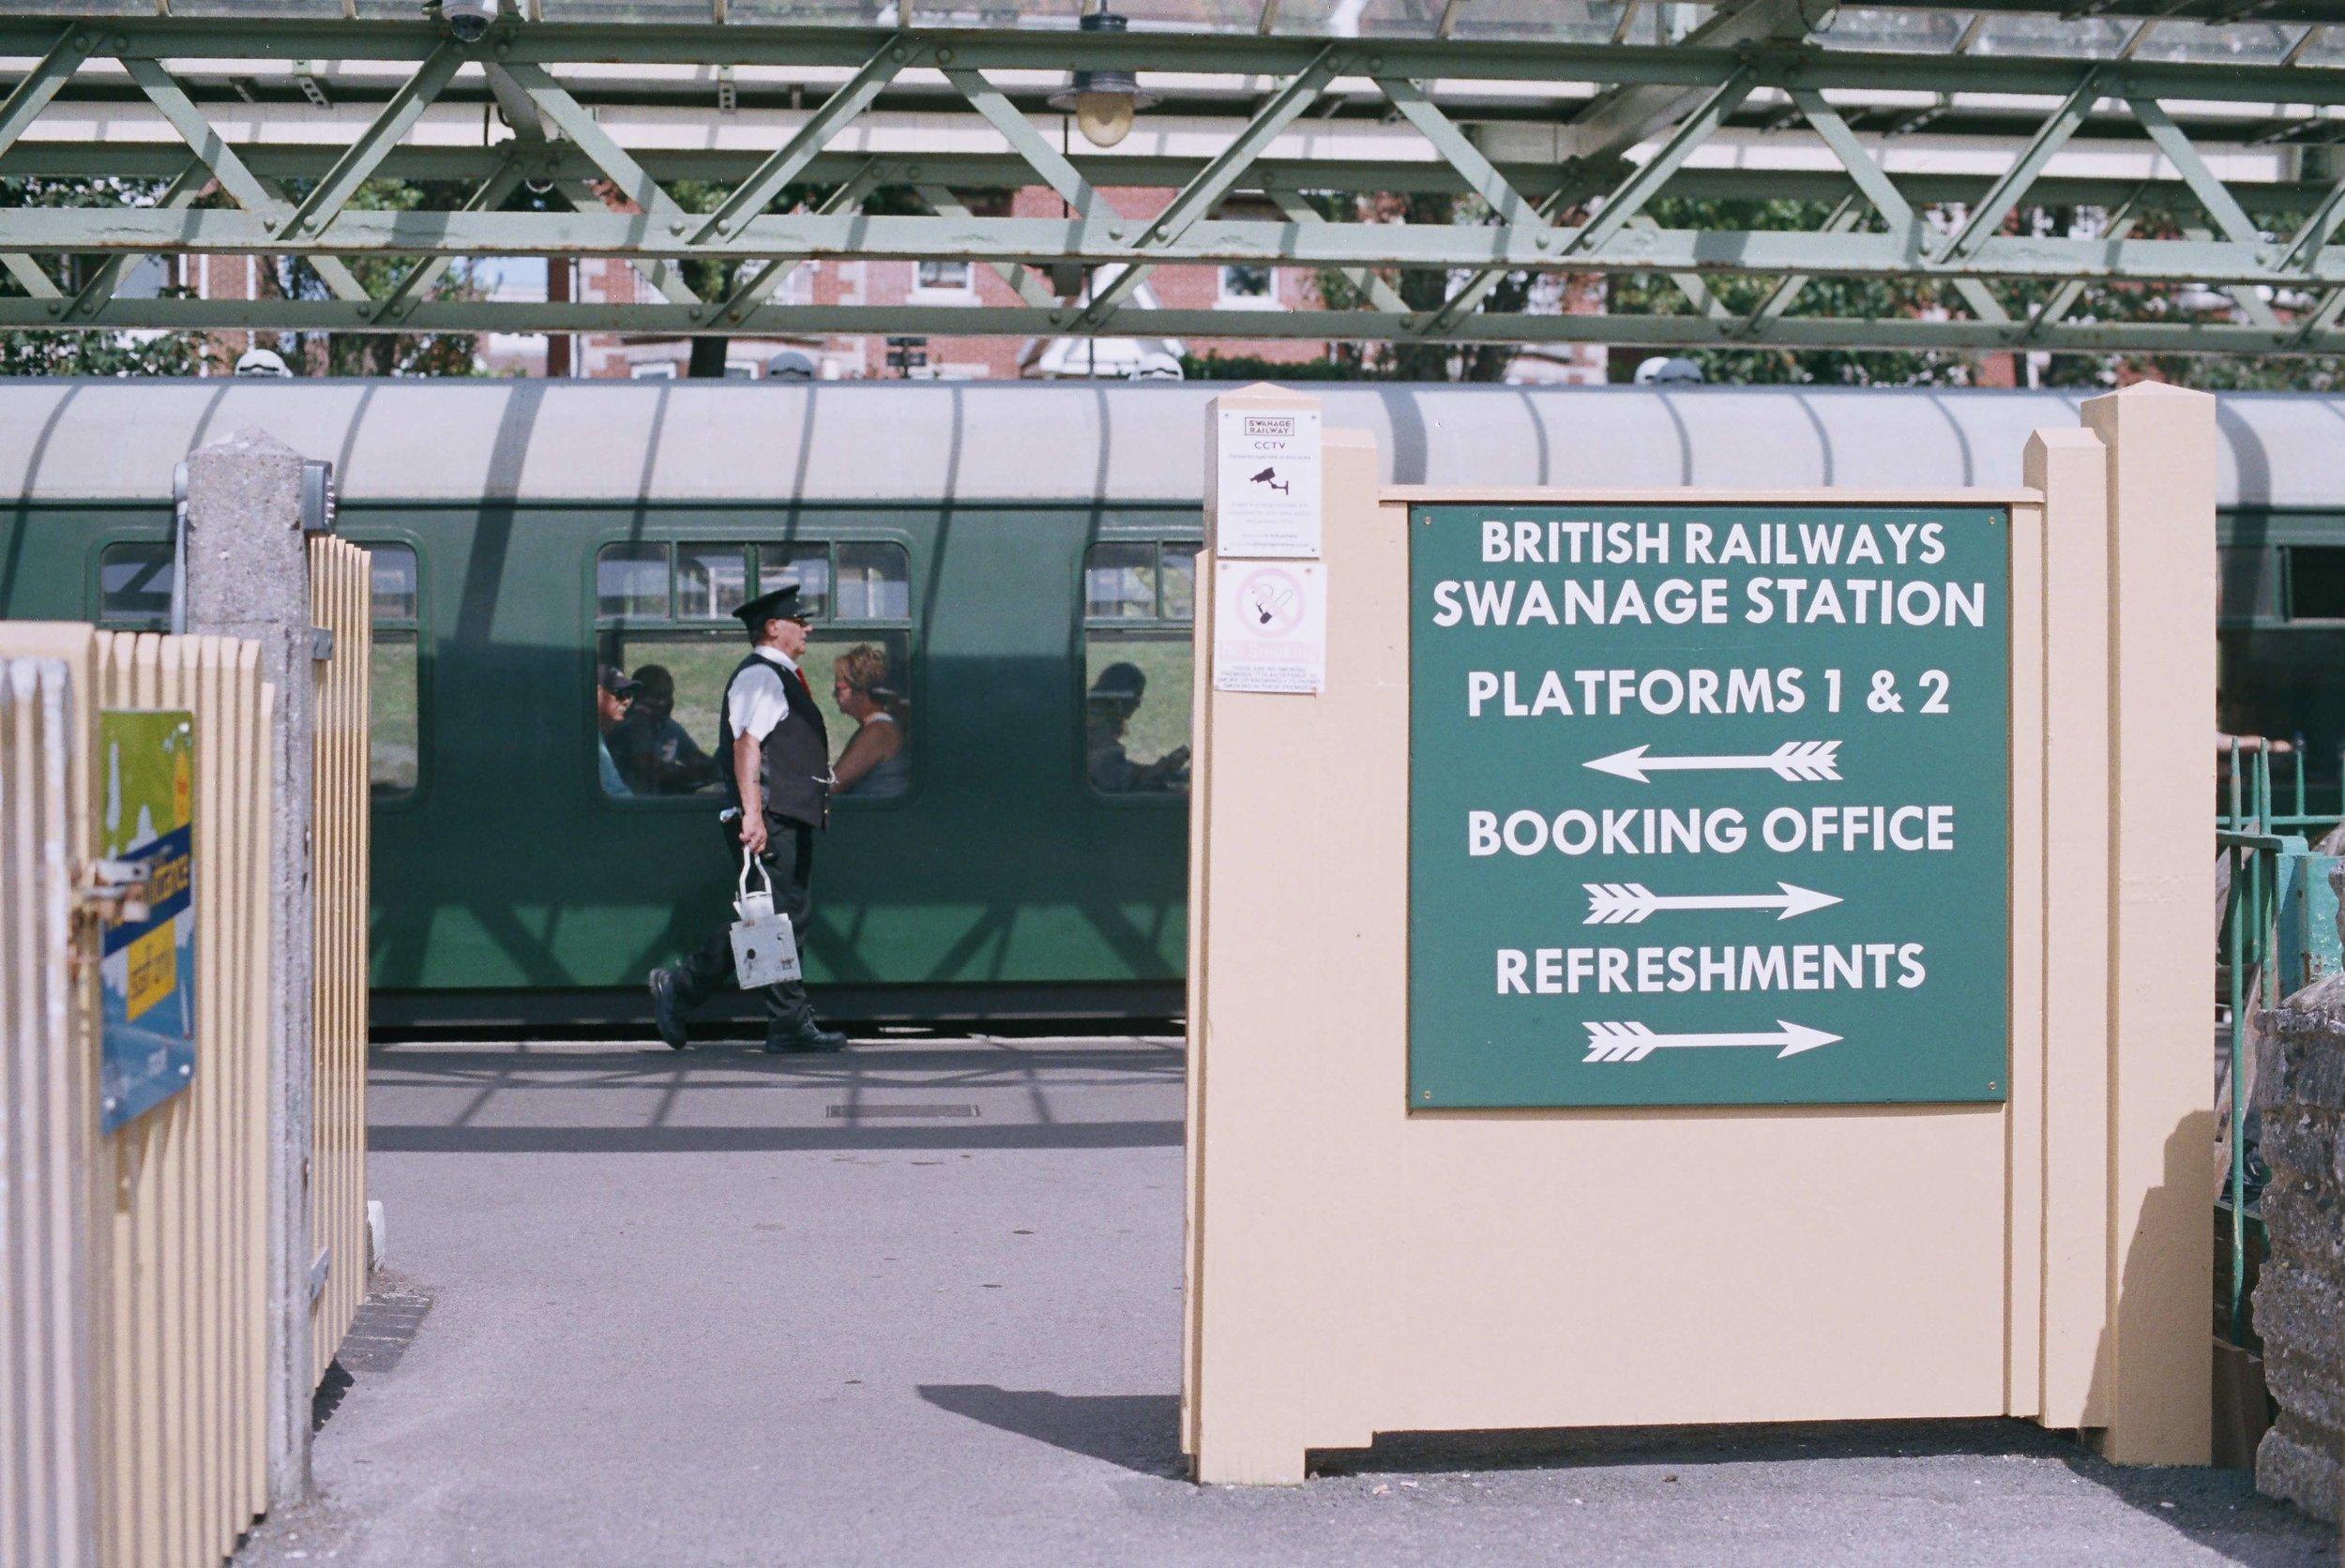 Swanage station